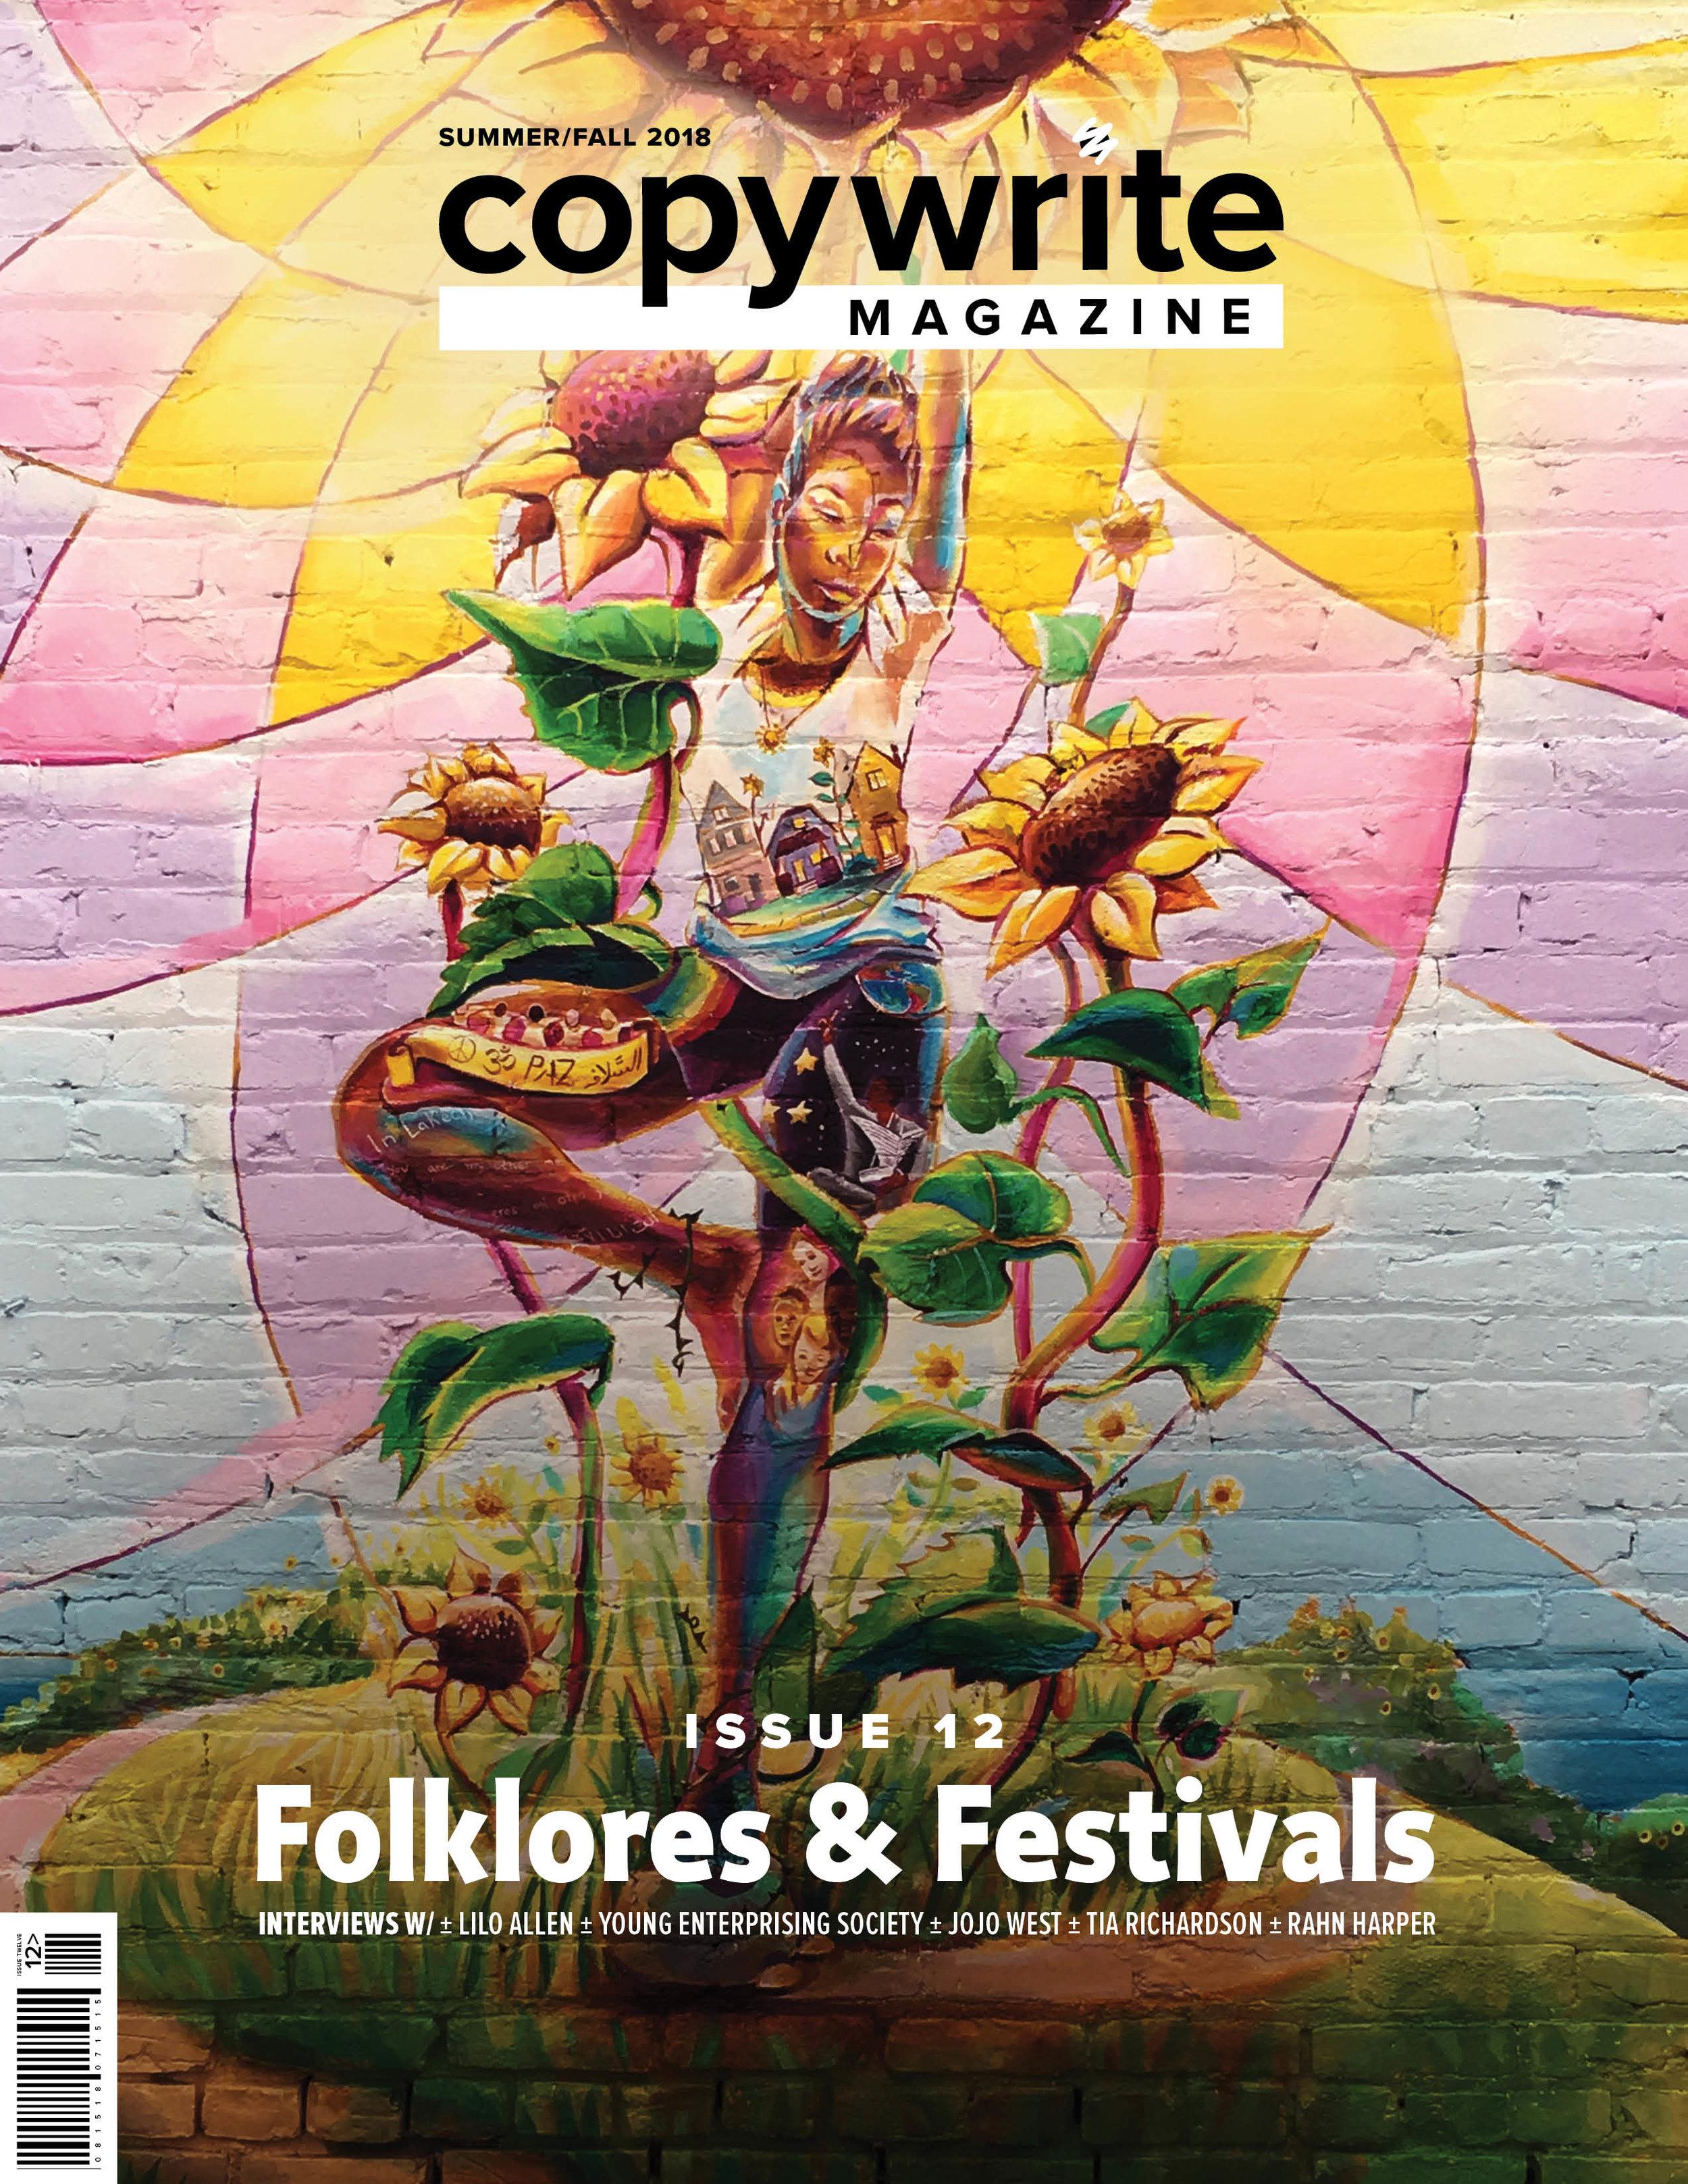 Issue12.jpg